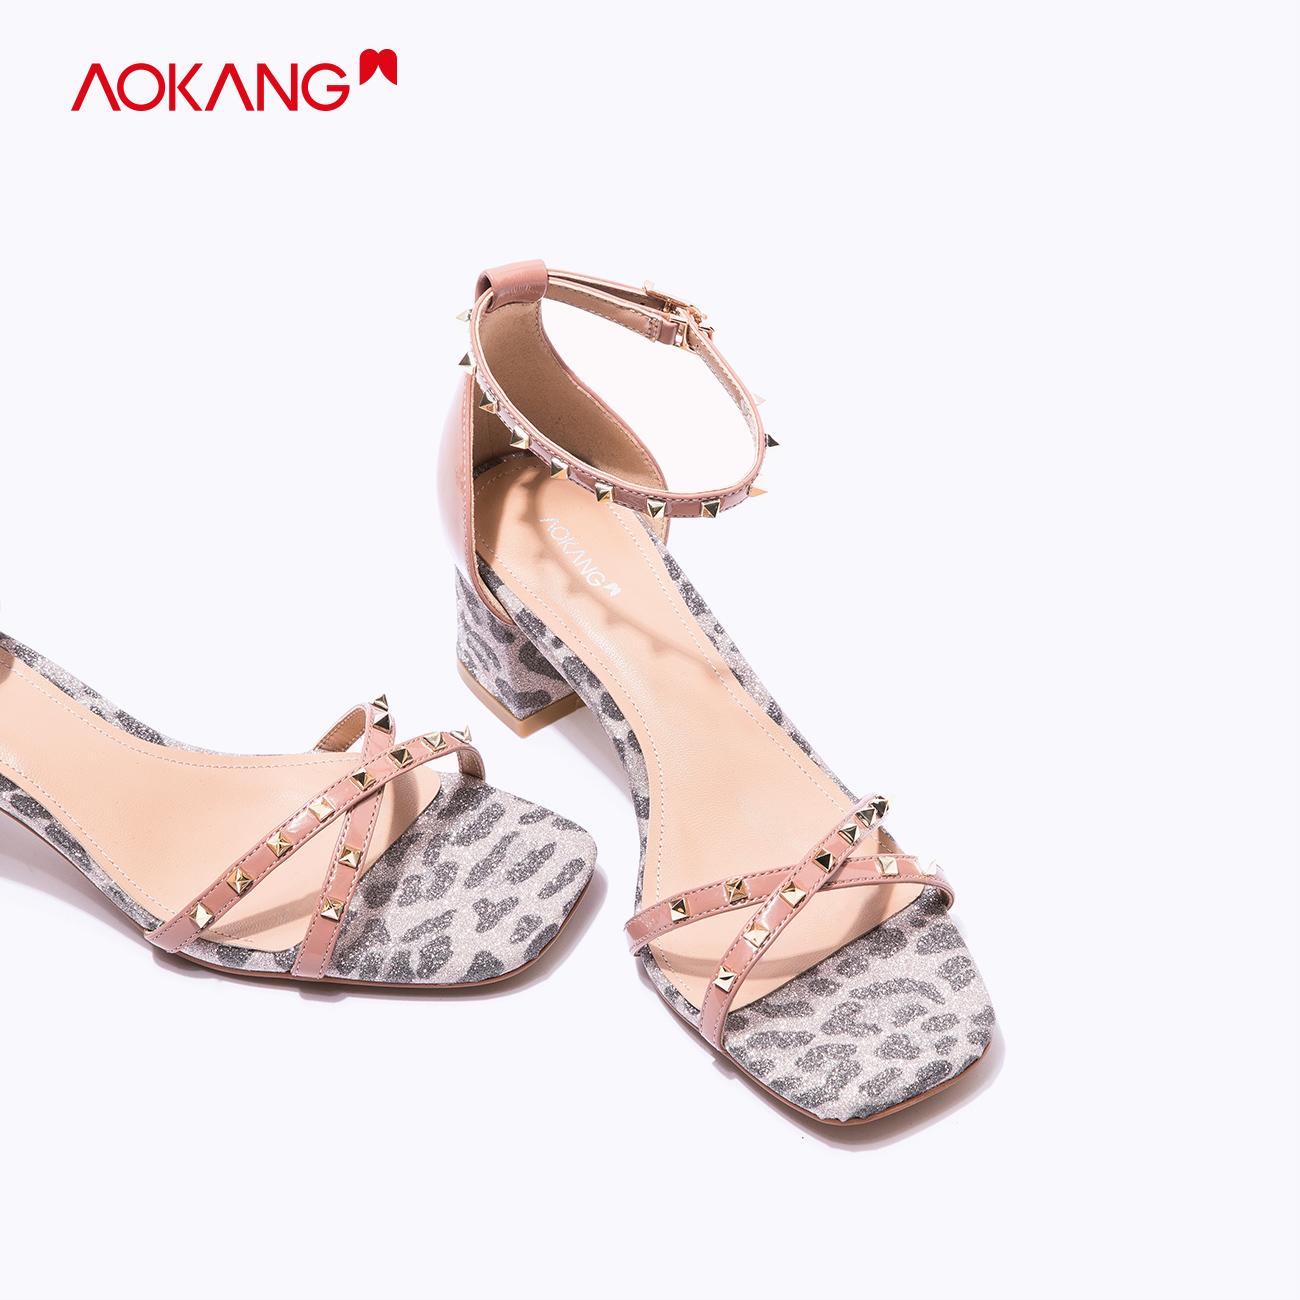 Aokang womens shoes summer new fashion temperament European and American rivet leopard pattern retro square head thick heel high heel sandals peep toe